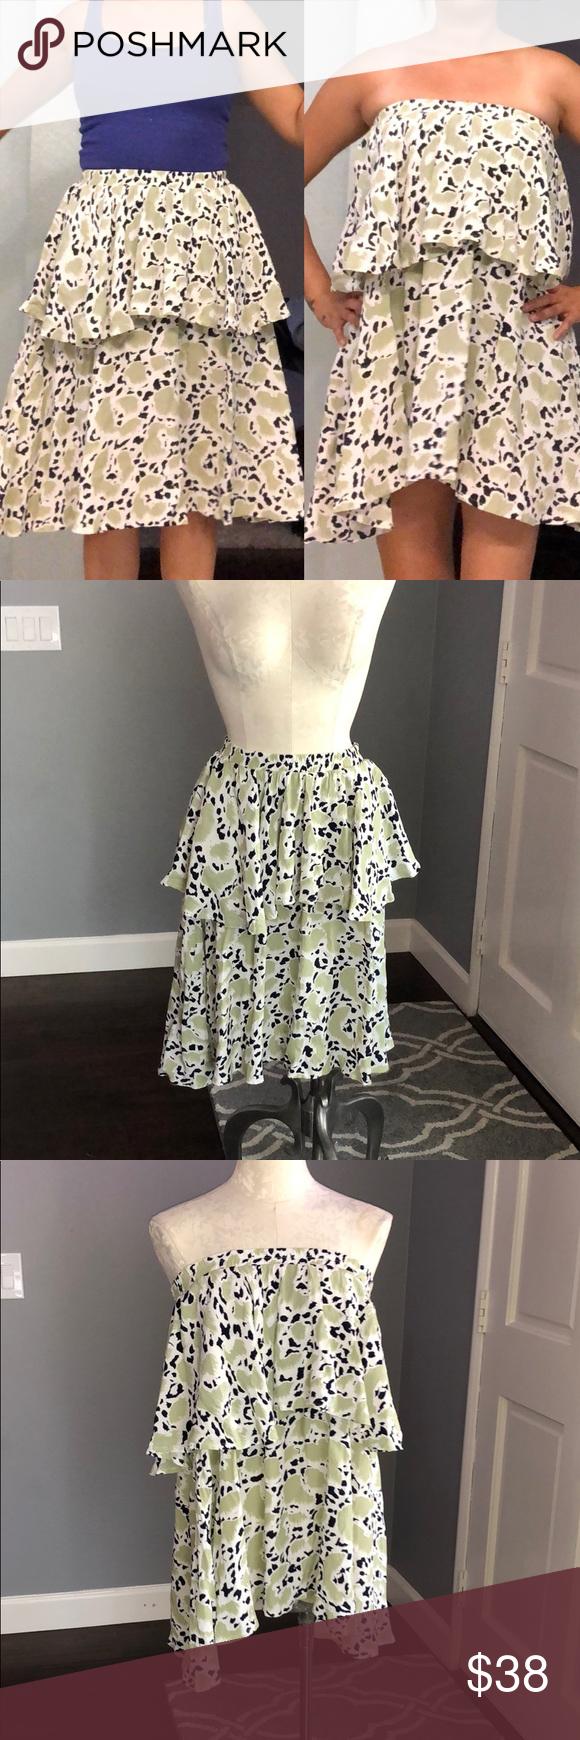 faithful the brand spotted top skirt pinterest